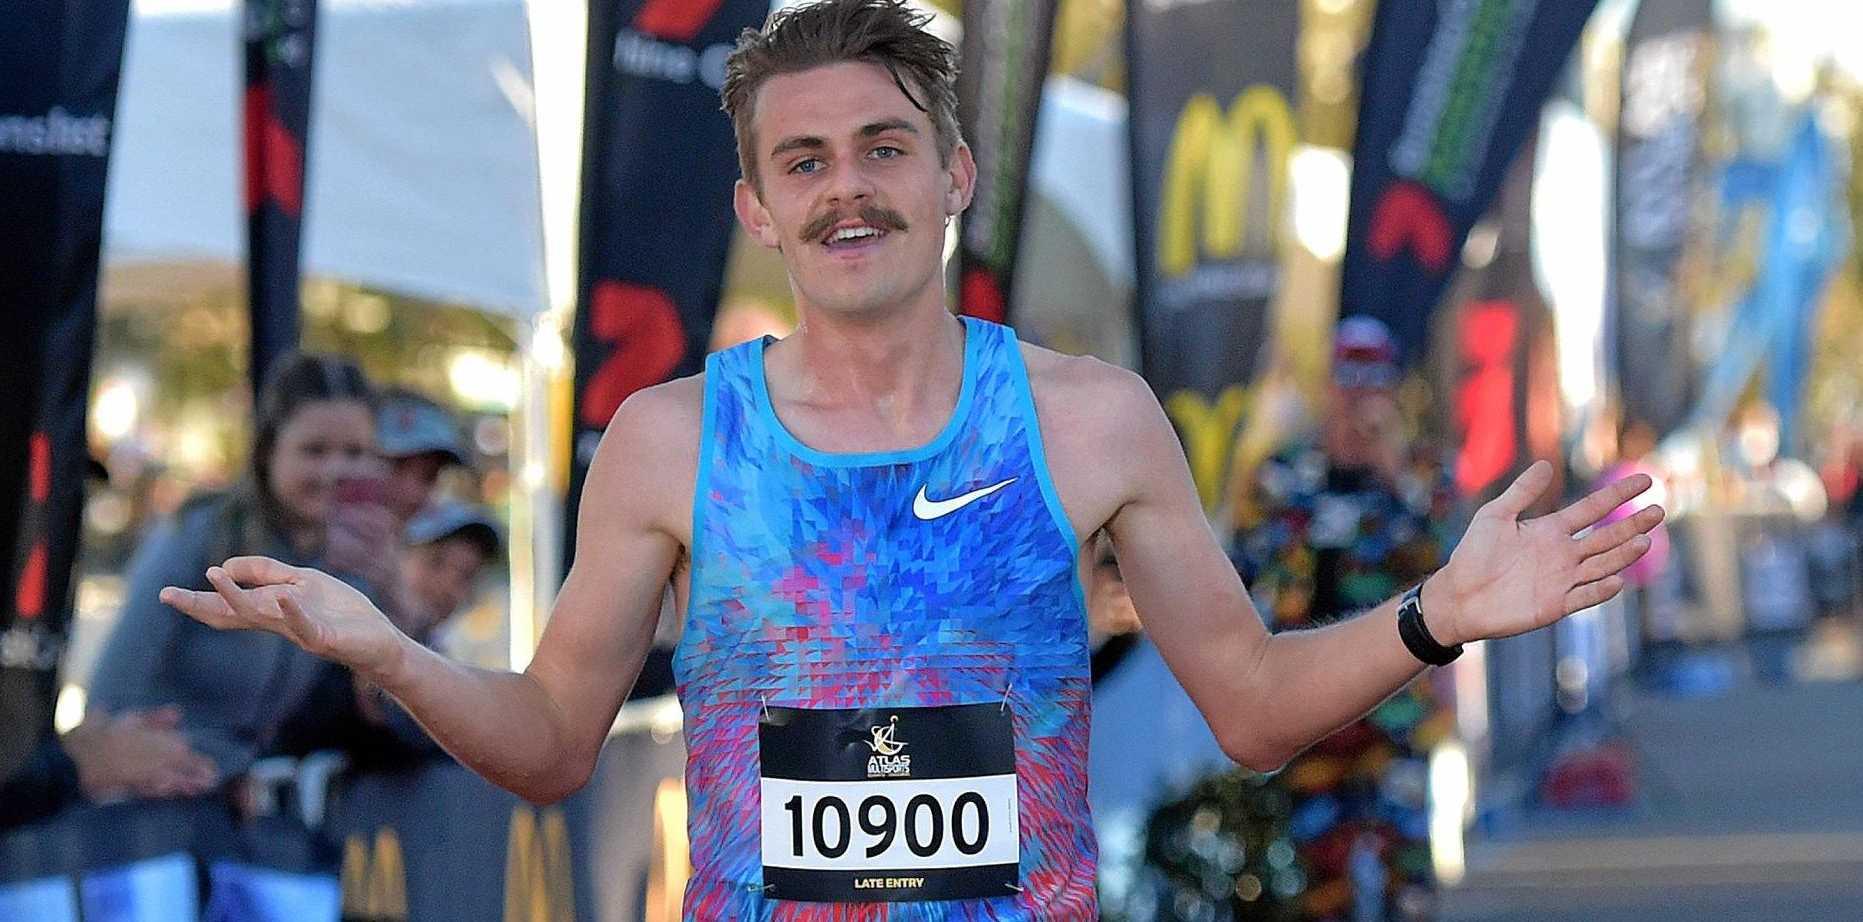 BIG FEAT: Sunshine Coast Marathon has been awarded Bronze Label status ahead of this year's event. Pictured is last year's half marathon winner Jack Rayner.